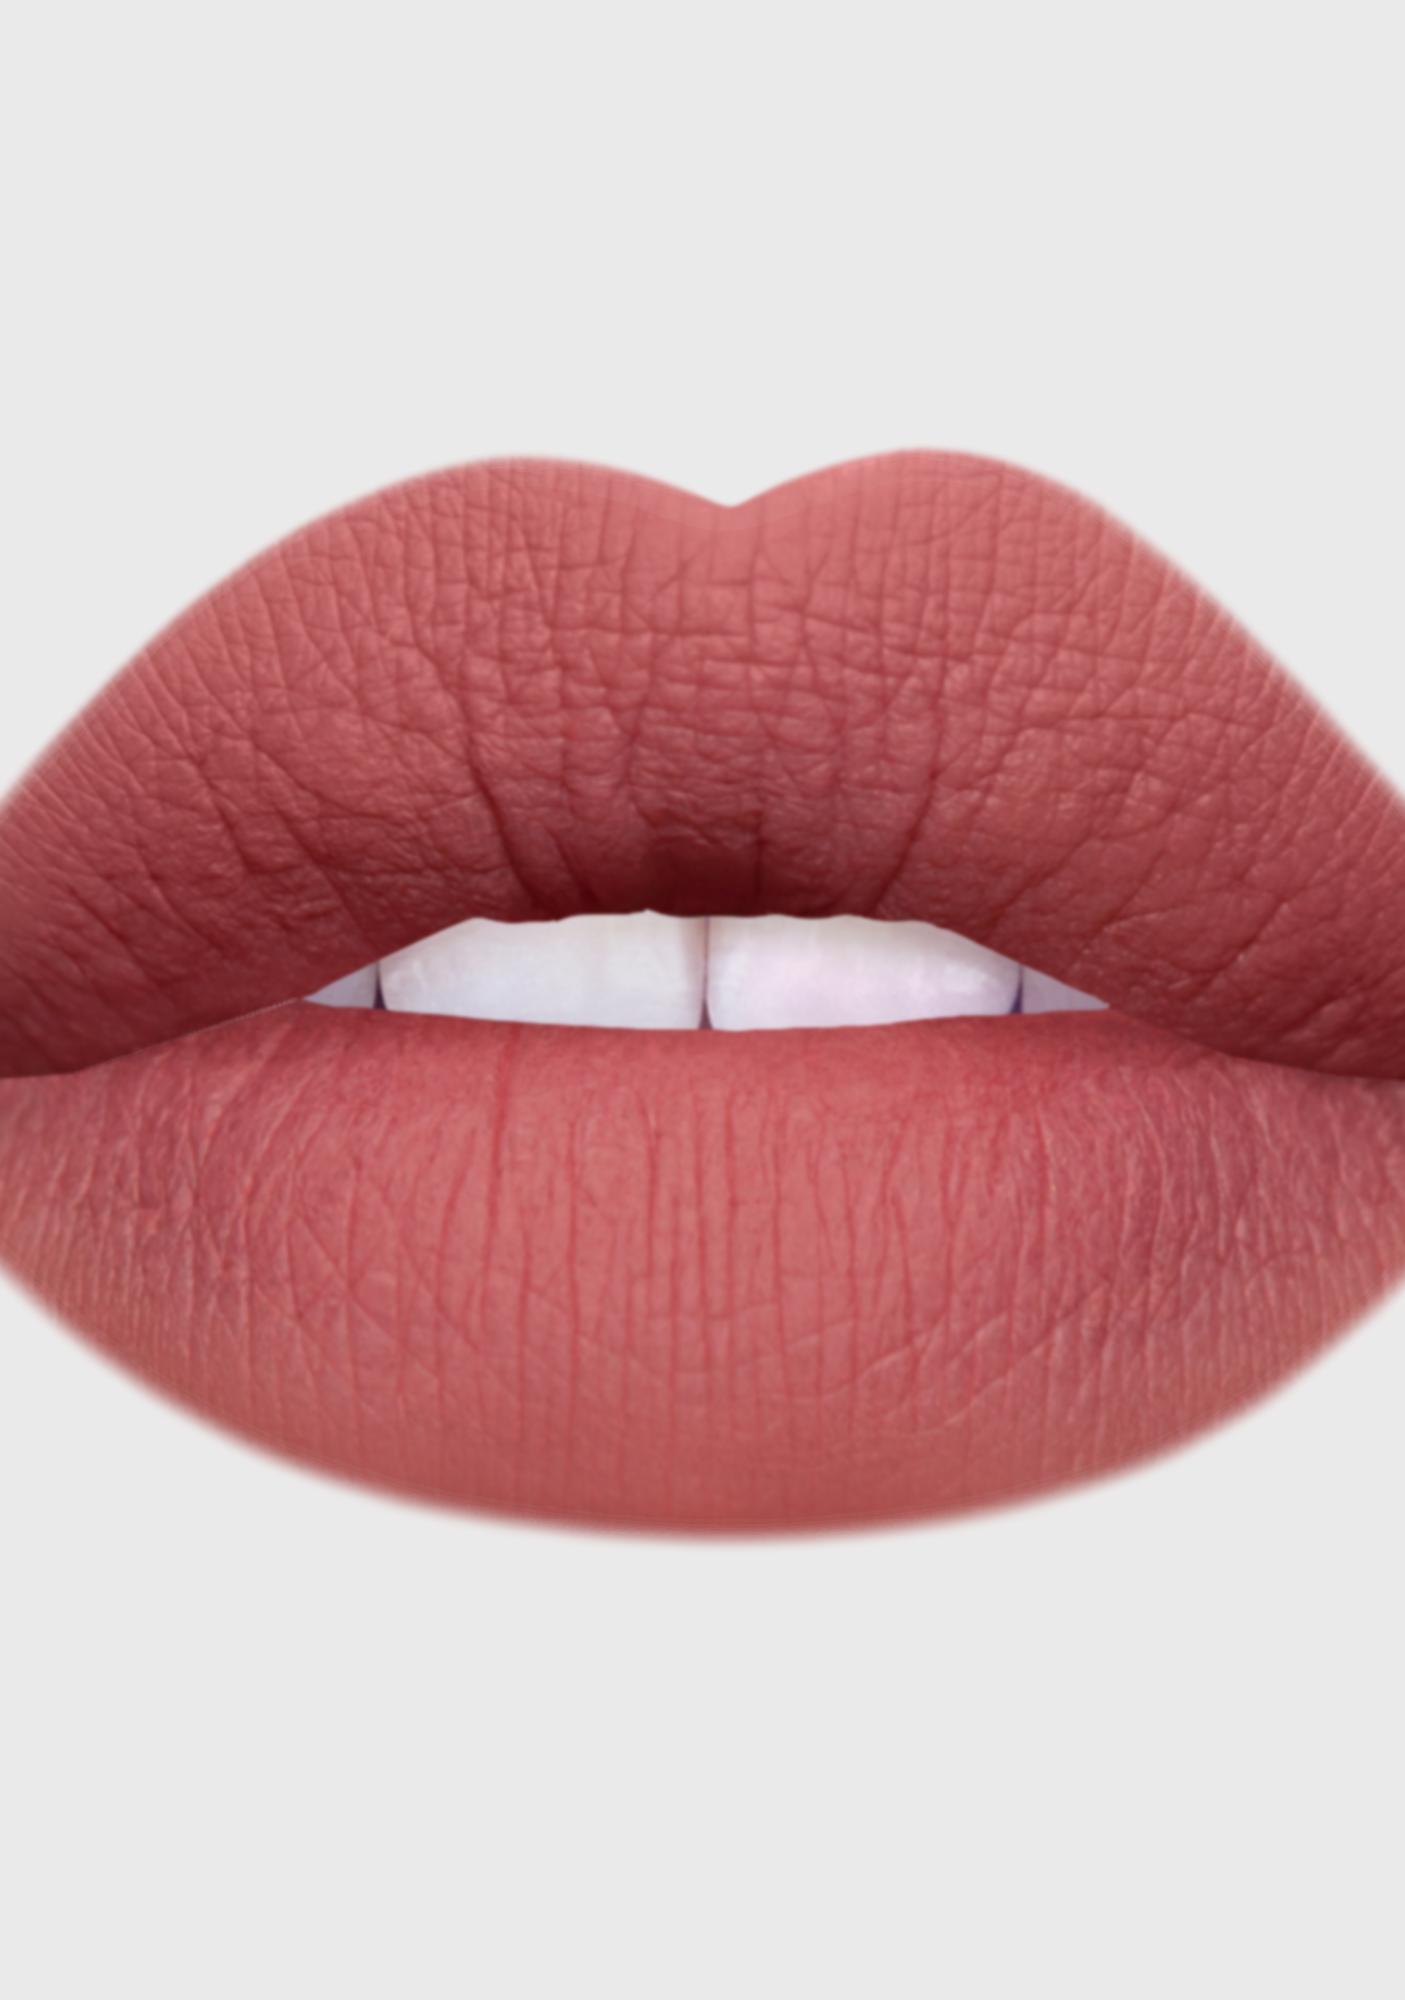 Lime Crime Turkish Delight Plushies Lipstick